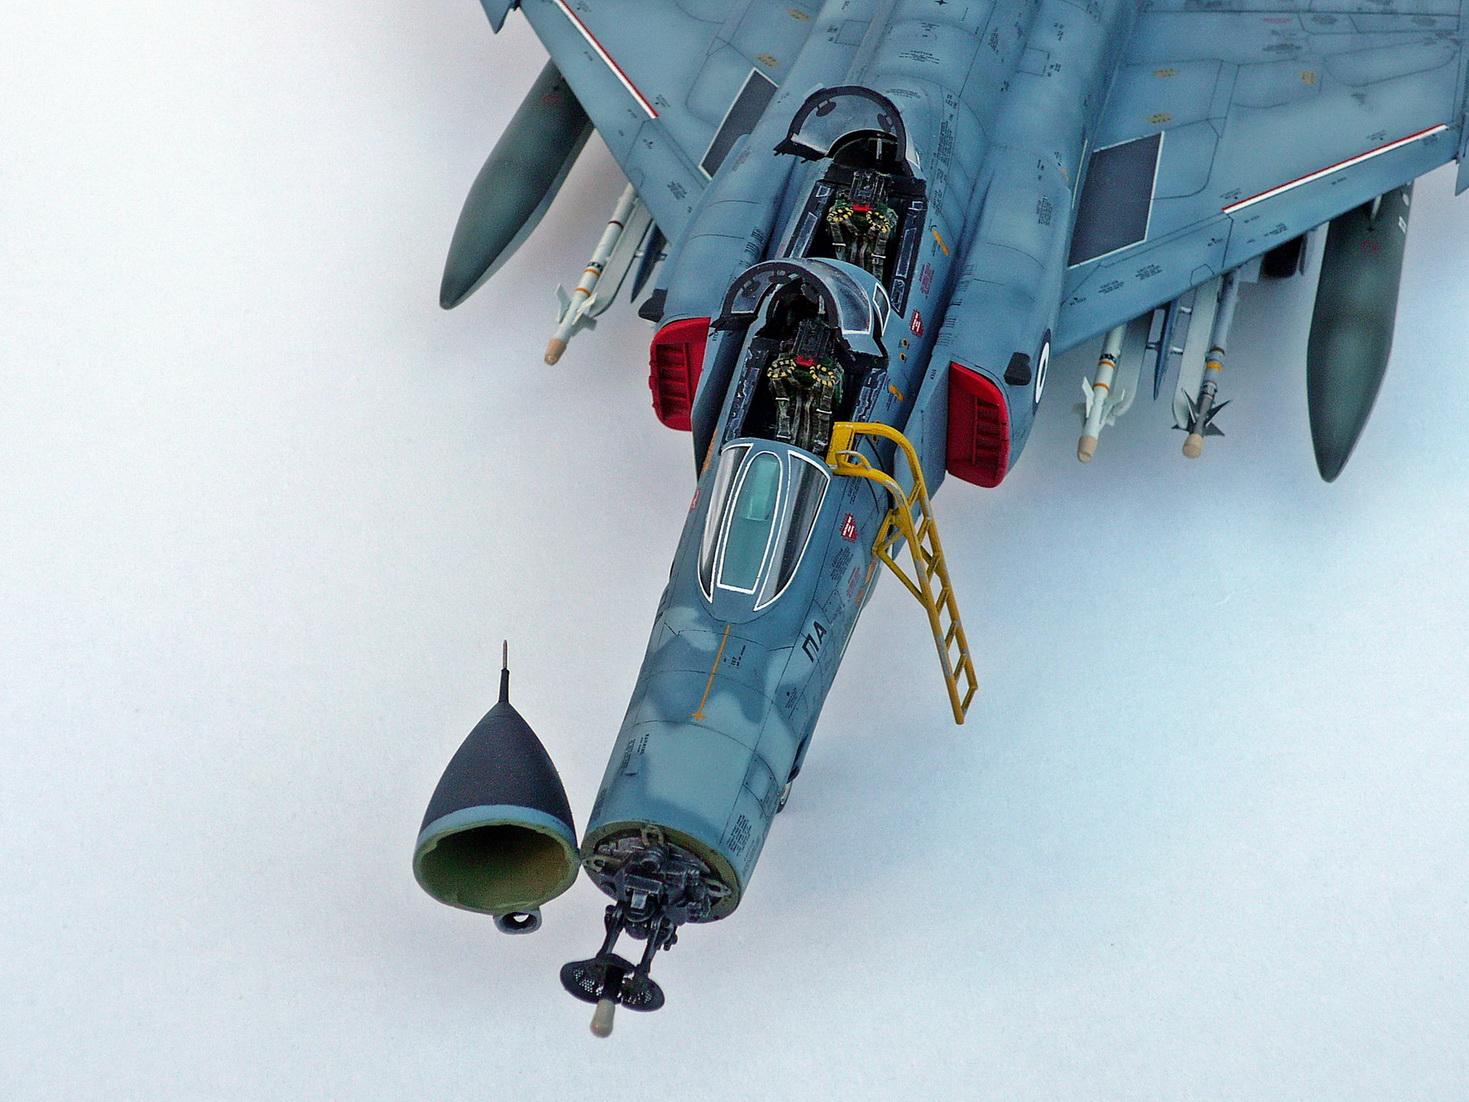 HAF F-4E Phantom II, Hasegawa 1/48